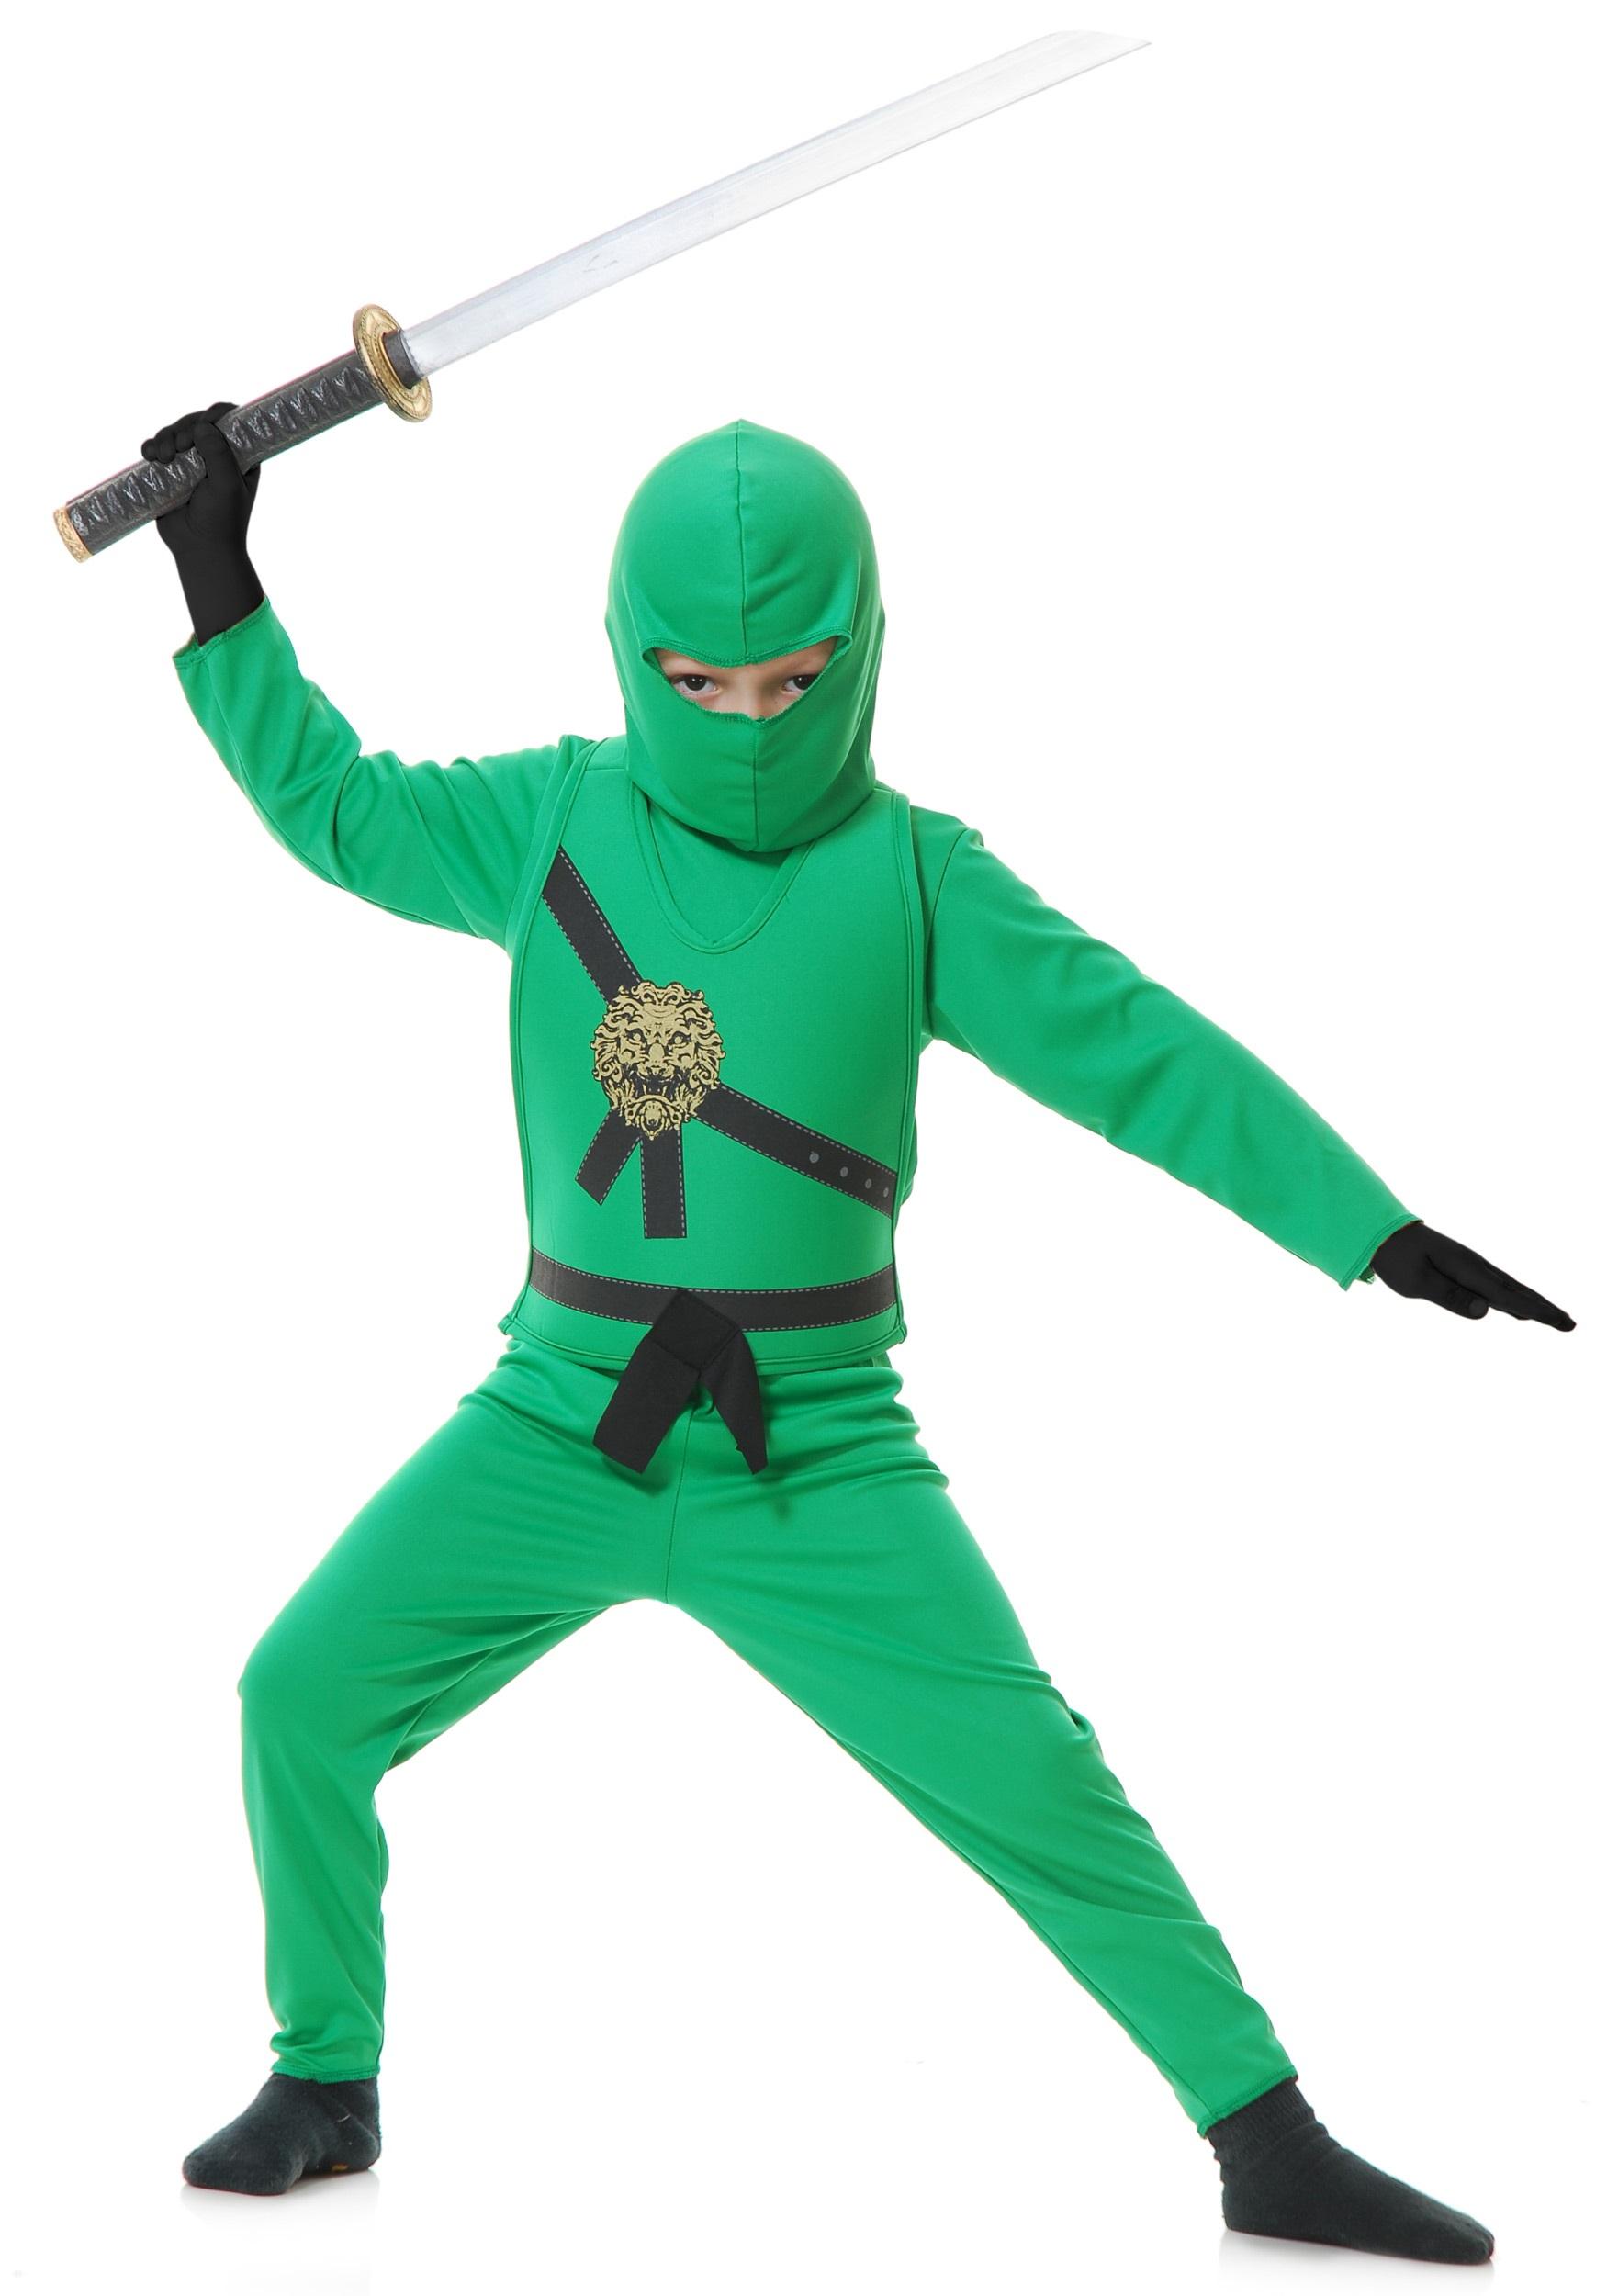 Child Green Ninja Costume  sc 1 st  Halloween Costumes & Green Ninja Costume for Kids